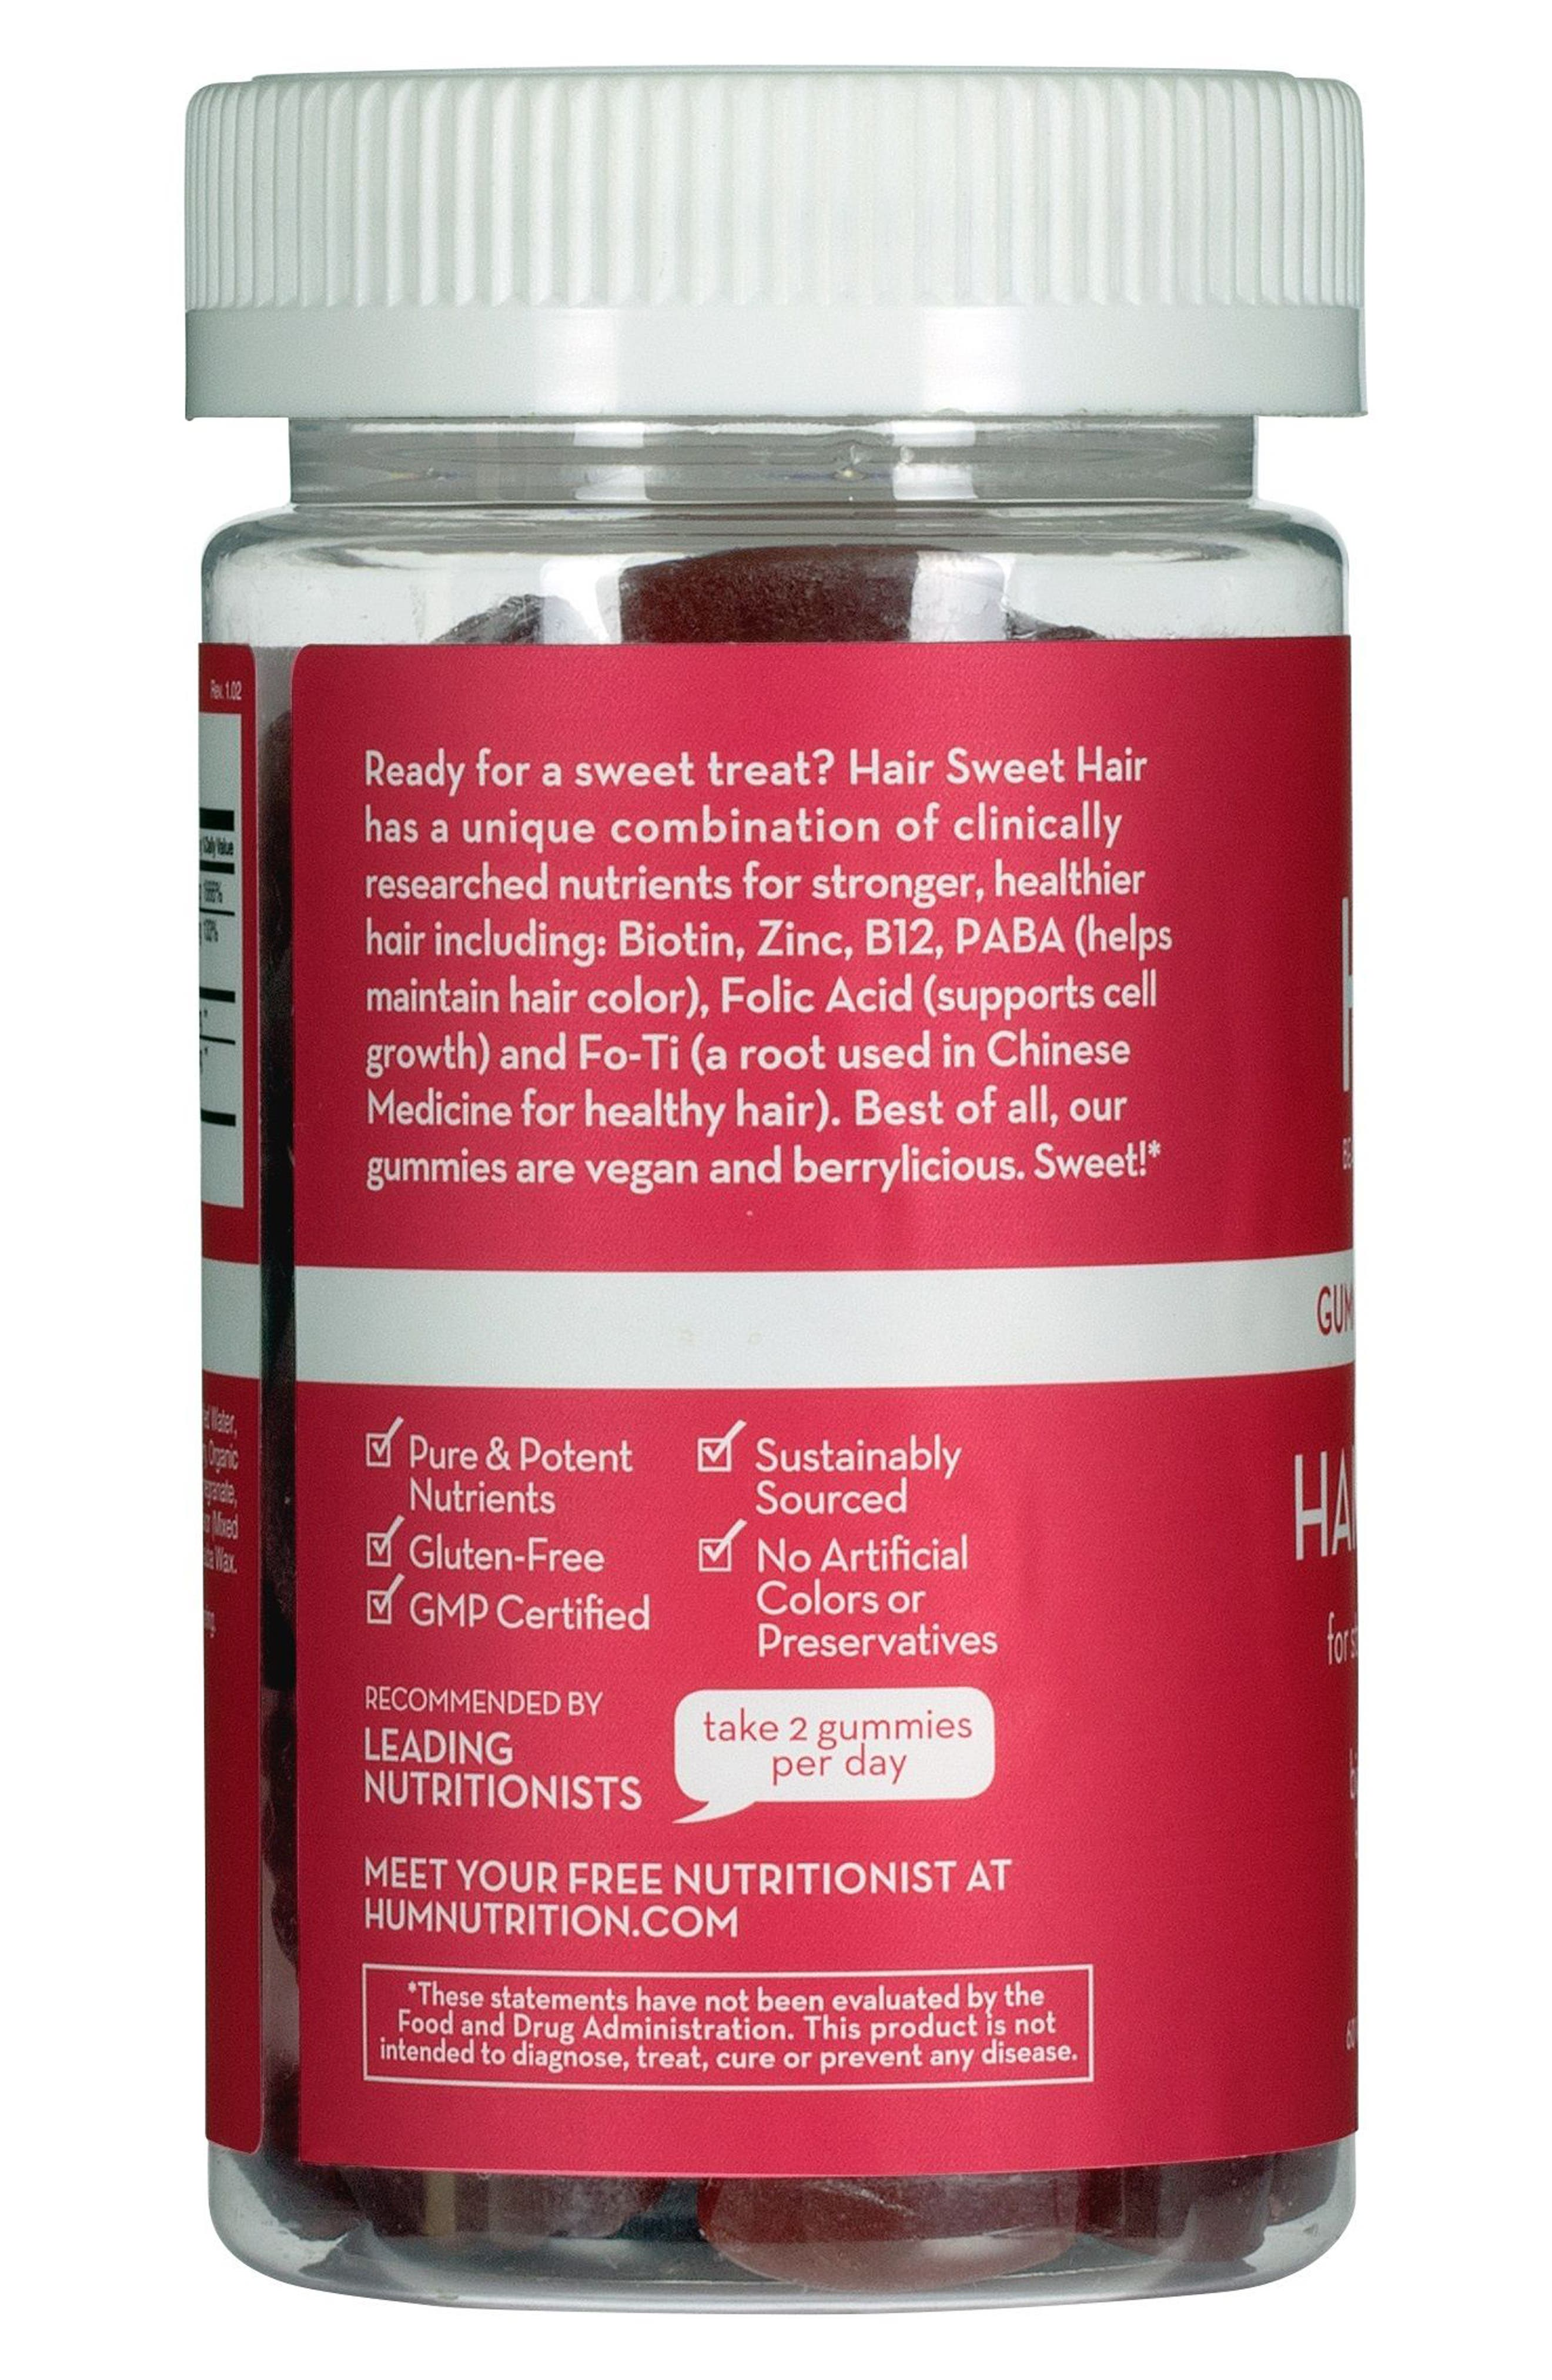 Hair Sweet Hair Gummies Supplement for Healthy Hair,                             Alternate thumbnail 4, color,                             NO COLOR